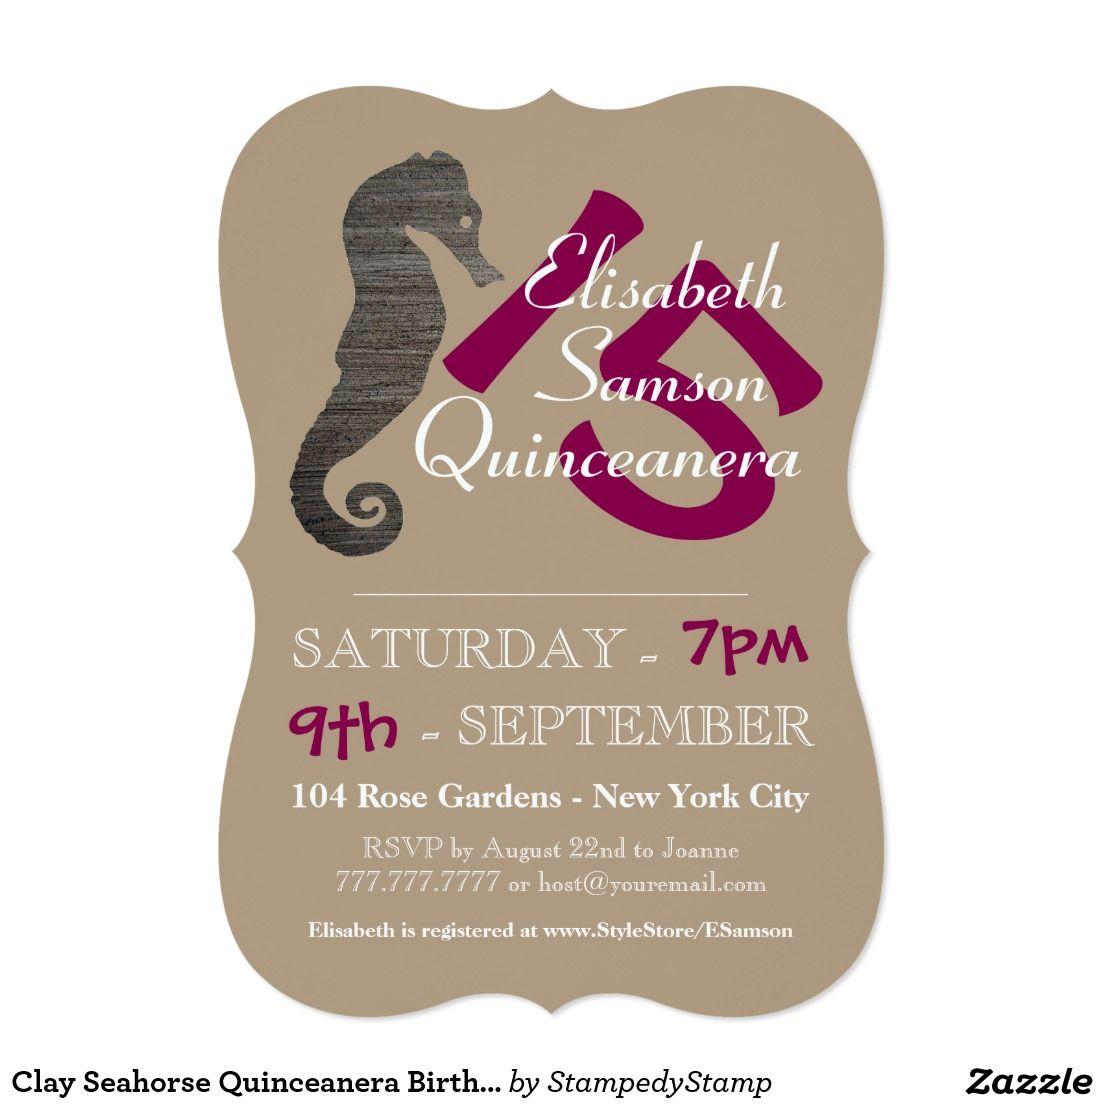 Clay seahorse quinceanera birthday card birthday invitations clay seahorse quinceanera birthday card m4hsunfo